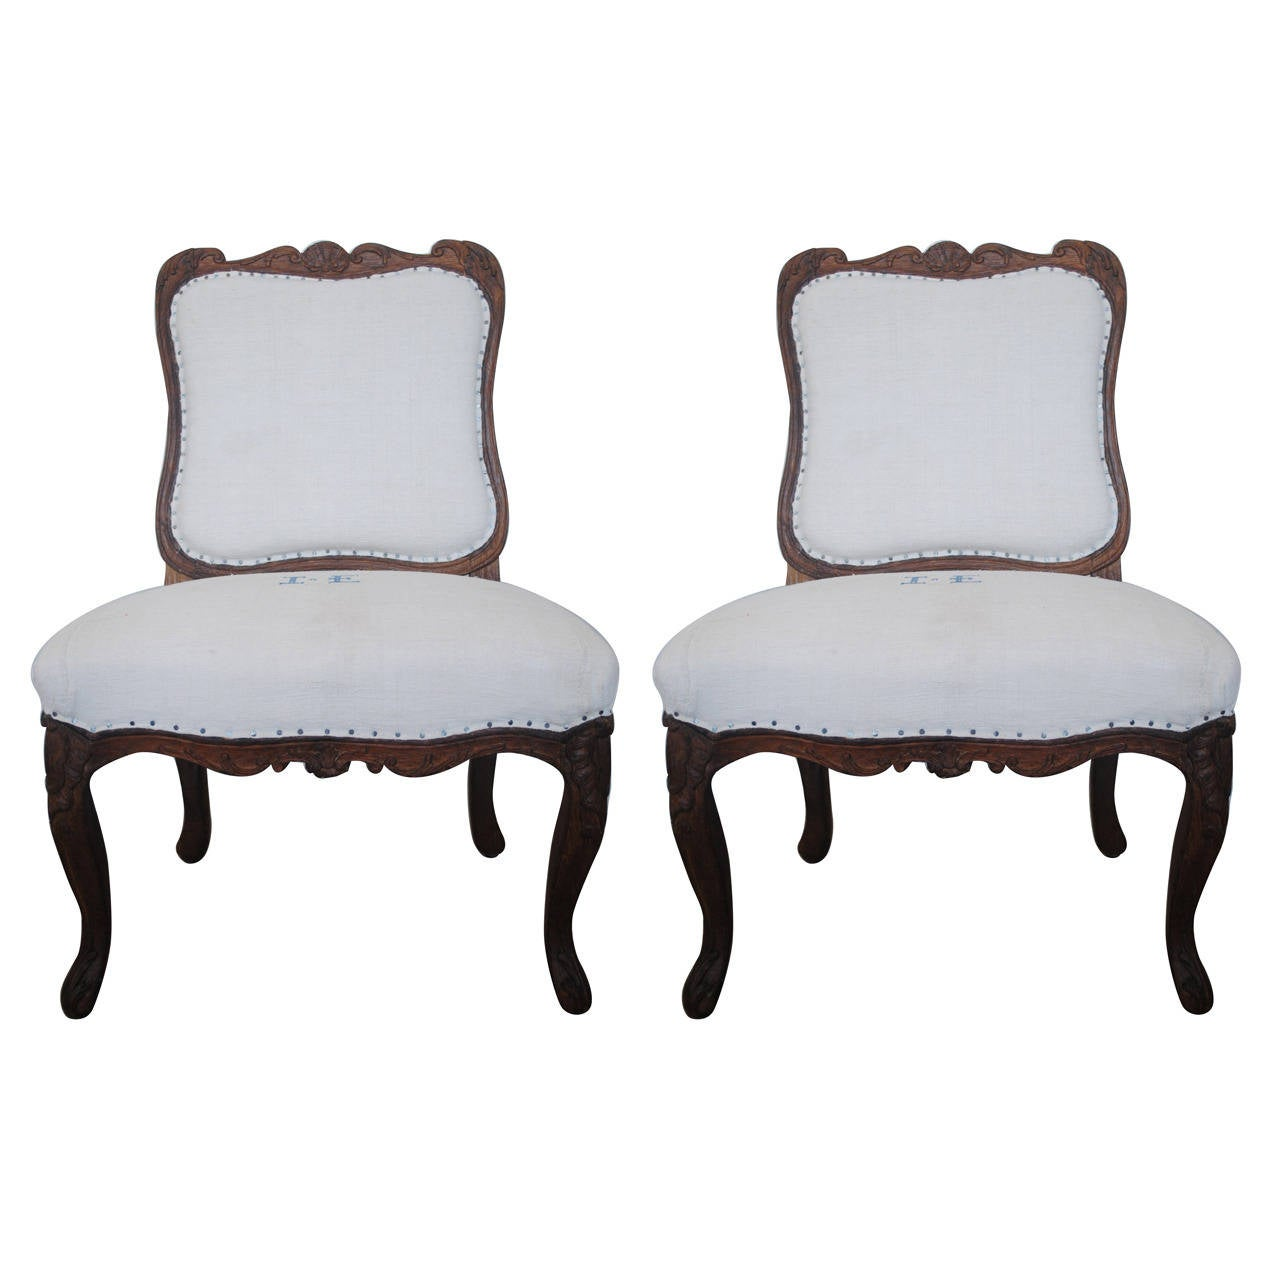 Pair of 19th Century Chestnut Slipper Chairs 1